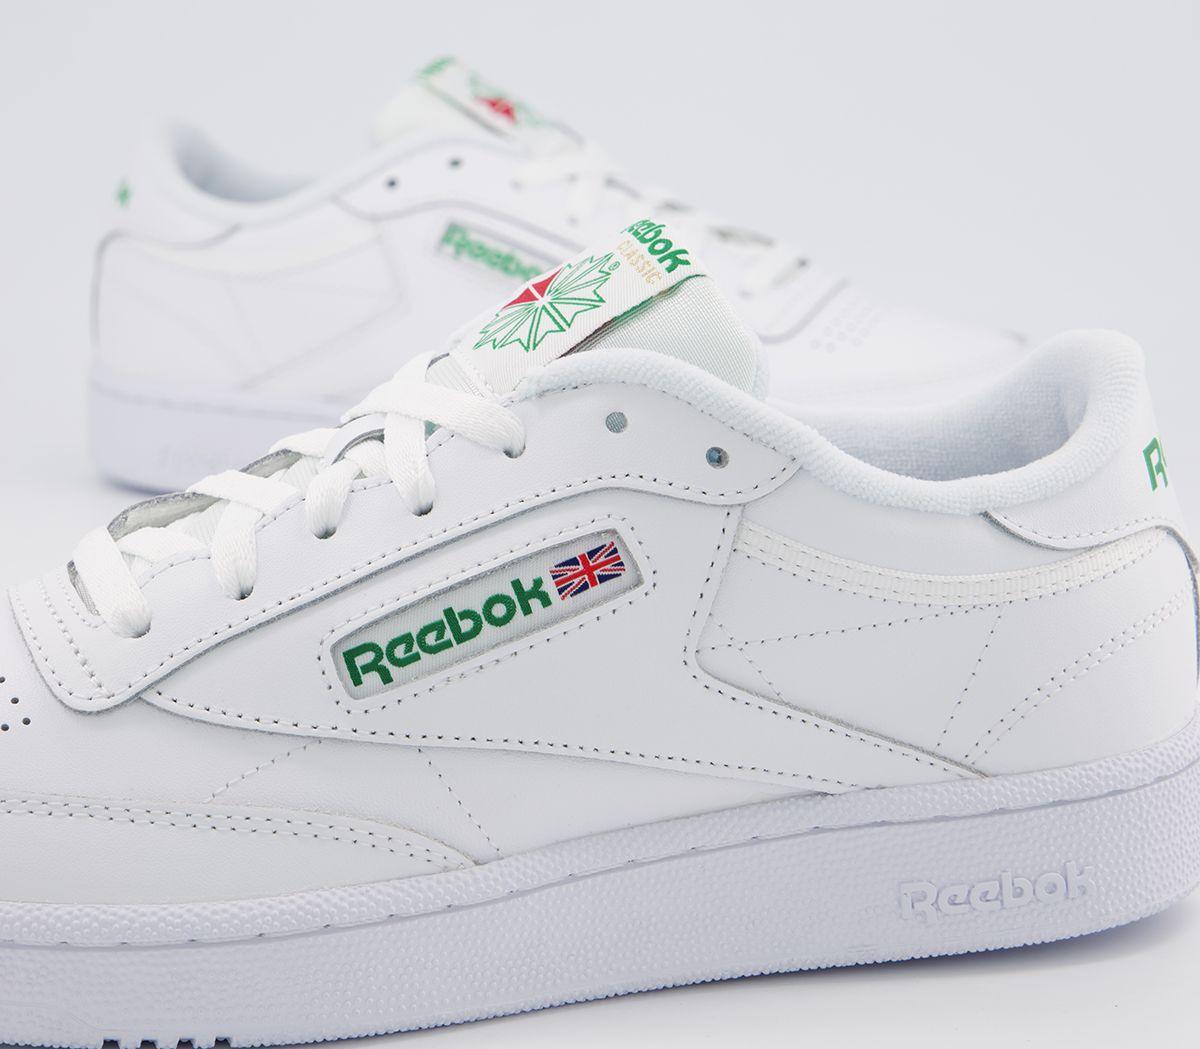 Reebok-Club-85-Bianco-Verde-C-Sneakers miniatura 7